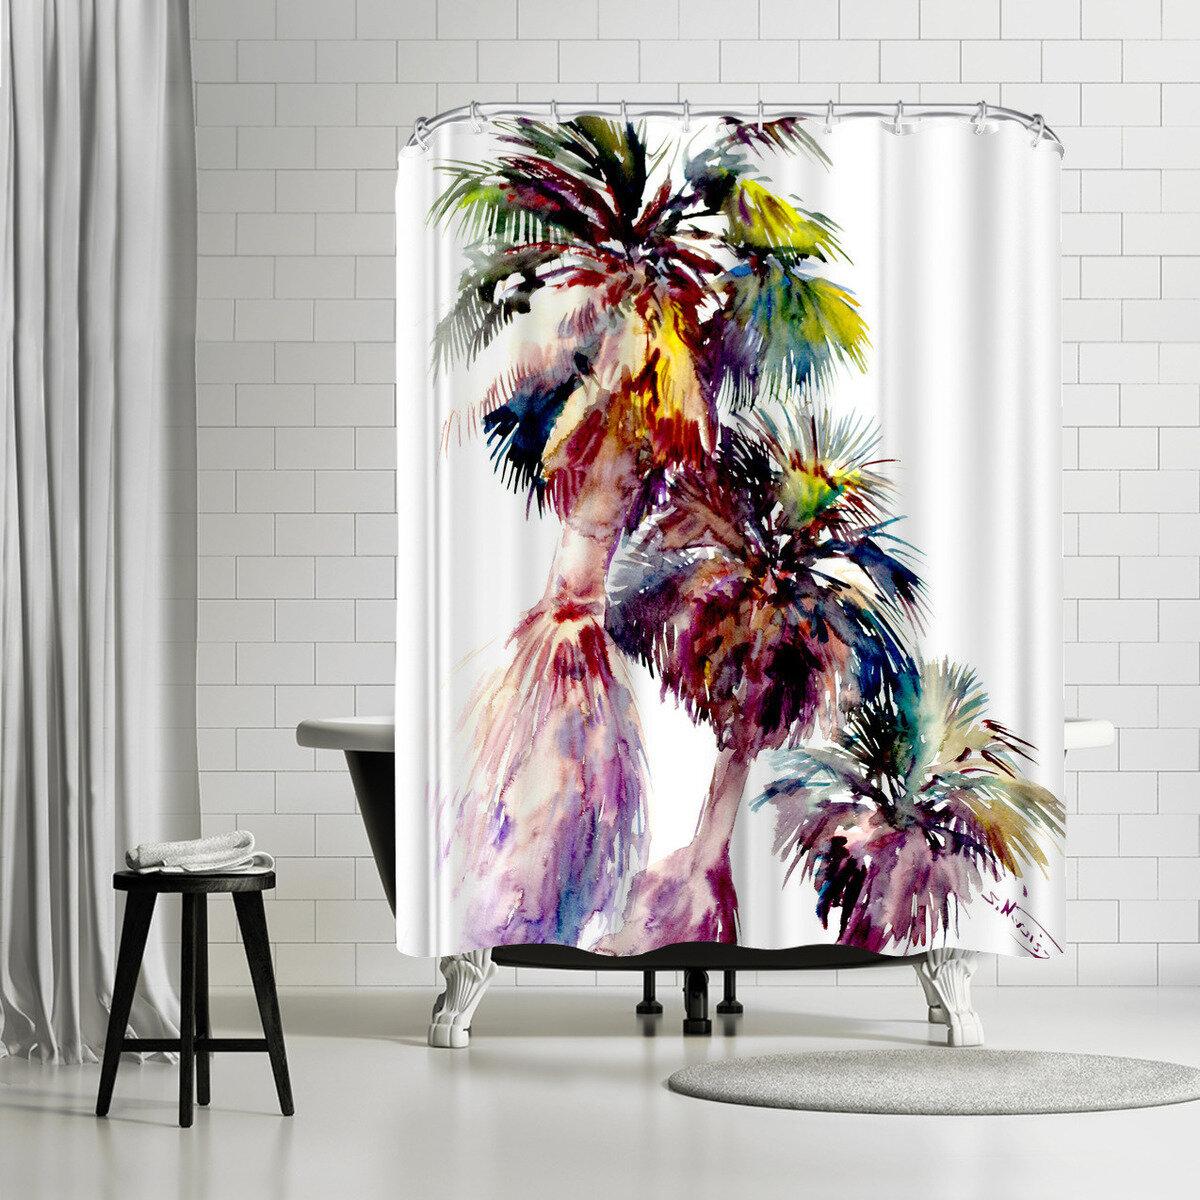 East Urban Home Suren Nersisyan Desert Palms Palm Springs Single Shower Curtain Wayfair